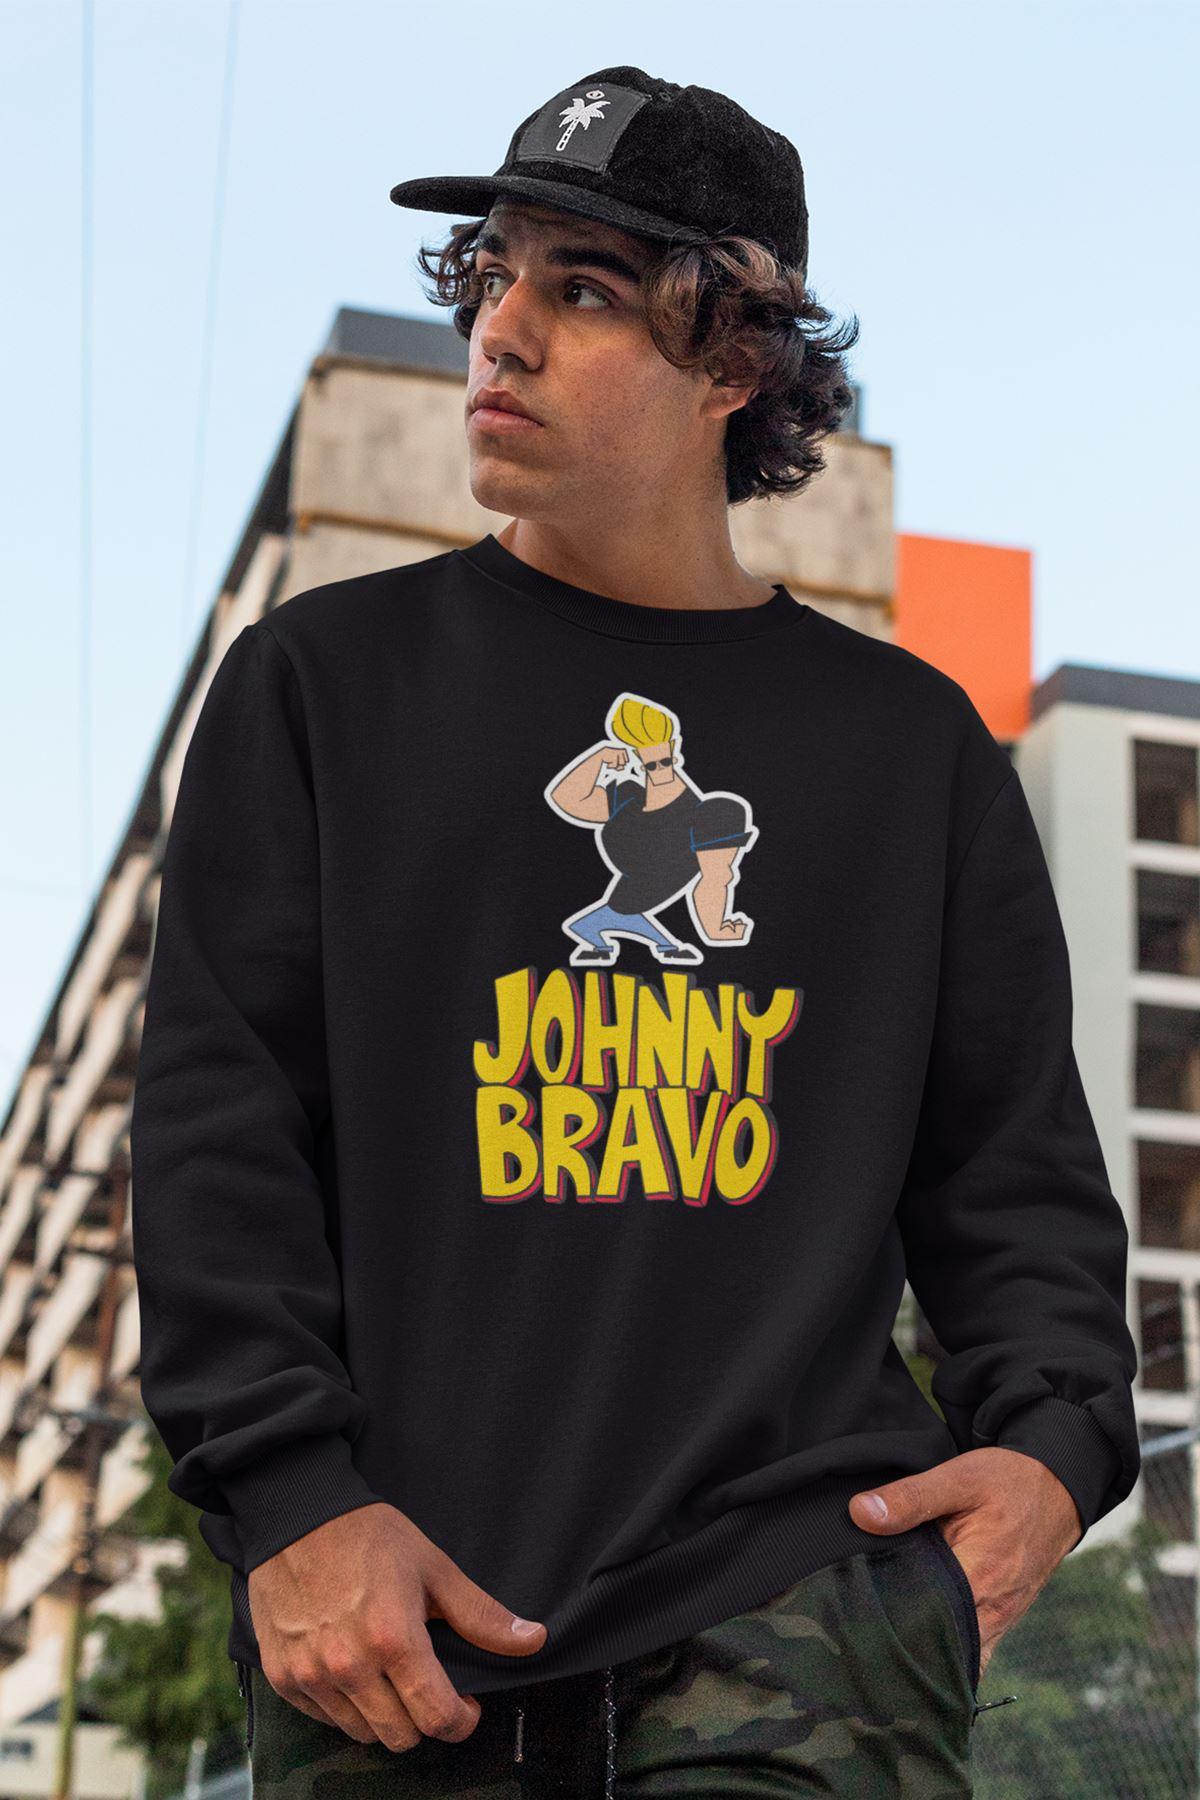 Johnny Bravo 220 Siyah Sweatshirt